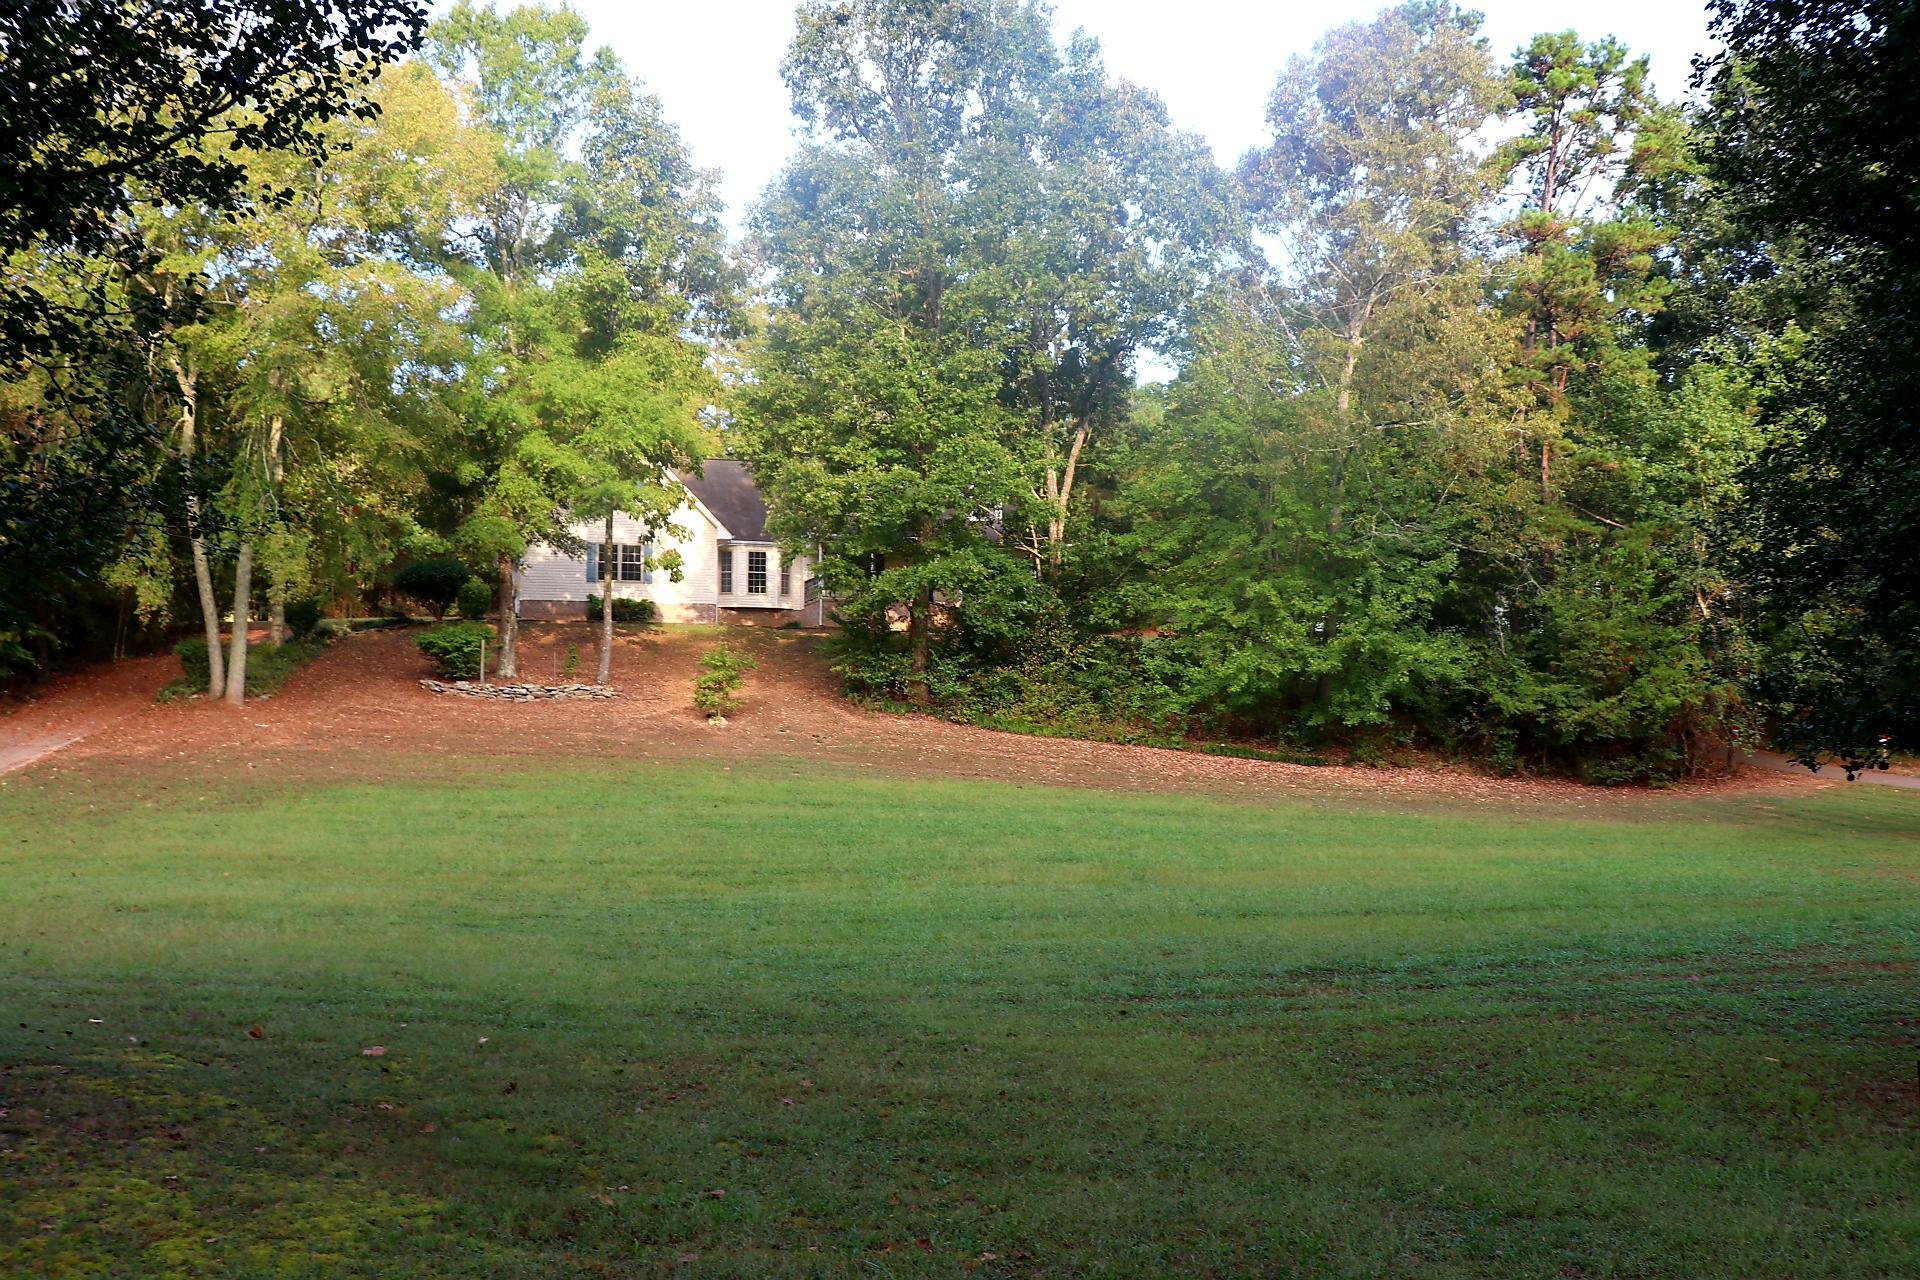 1582 Nw Eads Bluff Rd, Georgetown, TN 37336